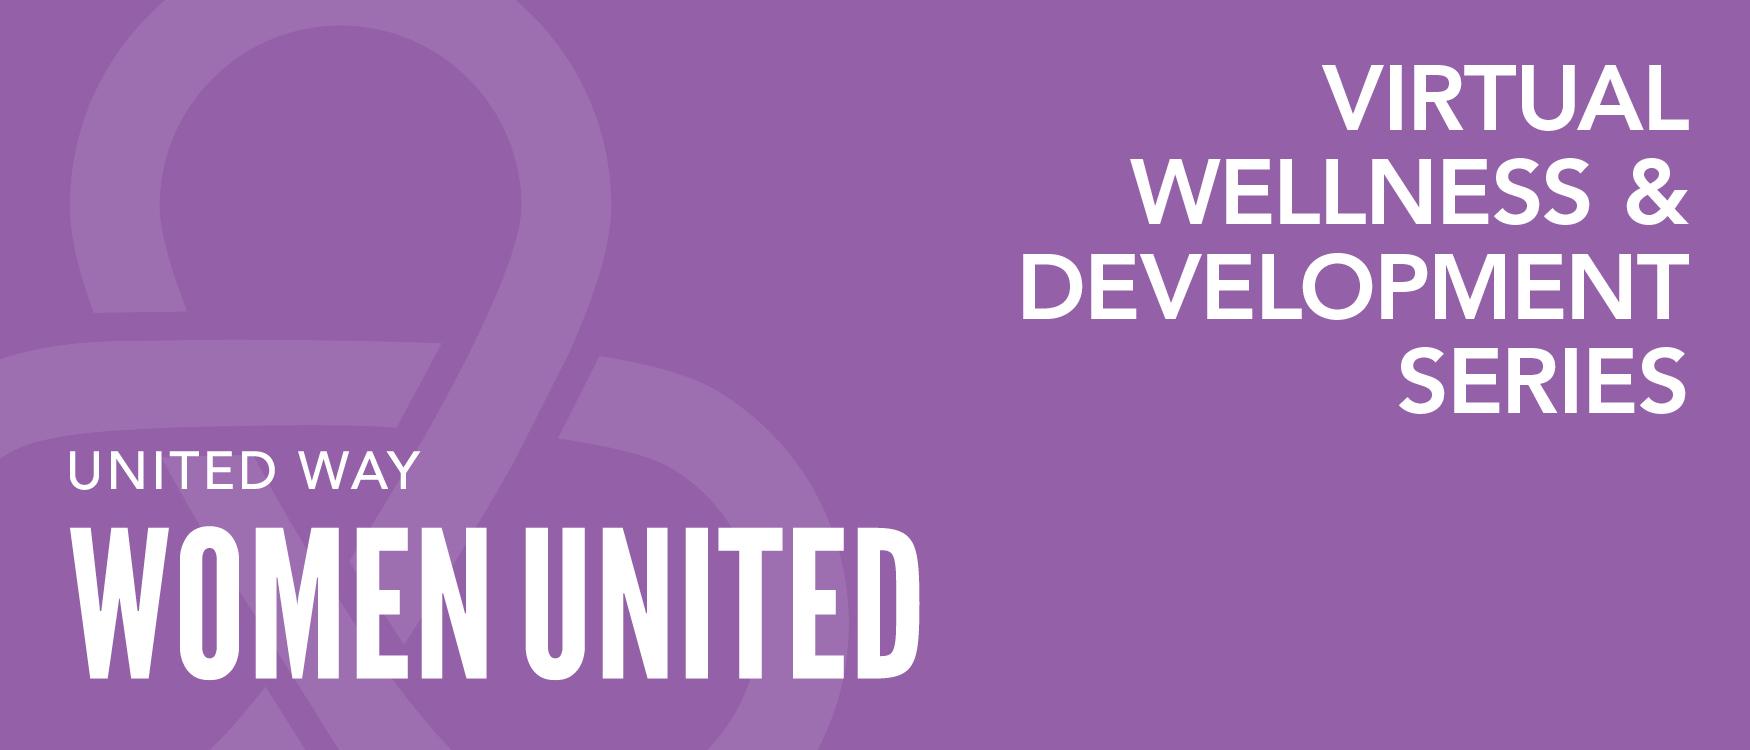 Women United virtual wellness and development series